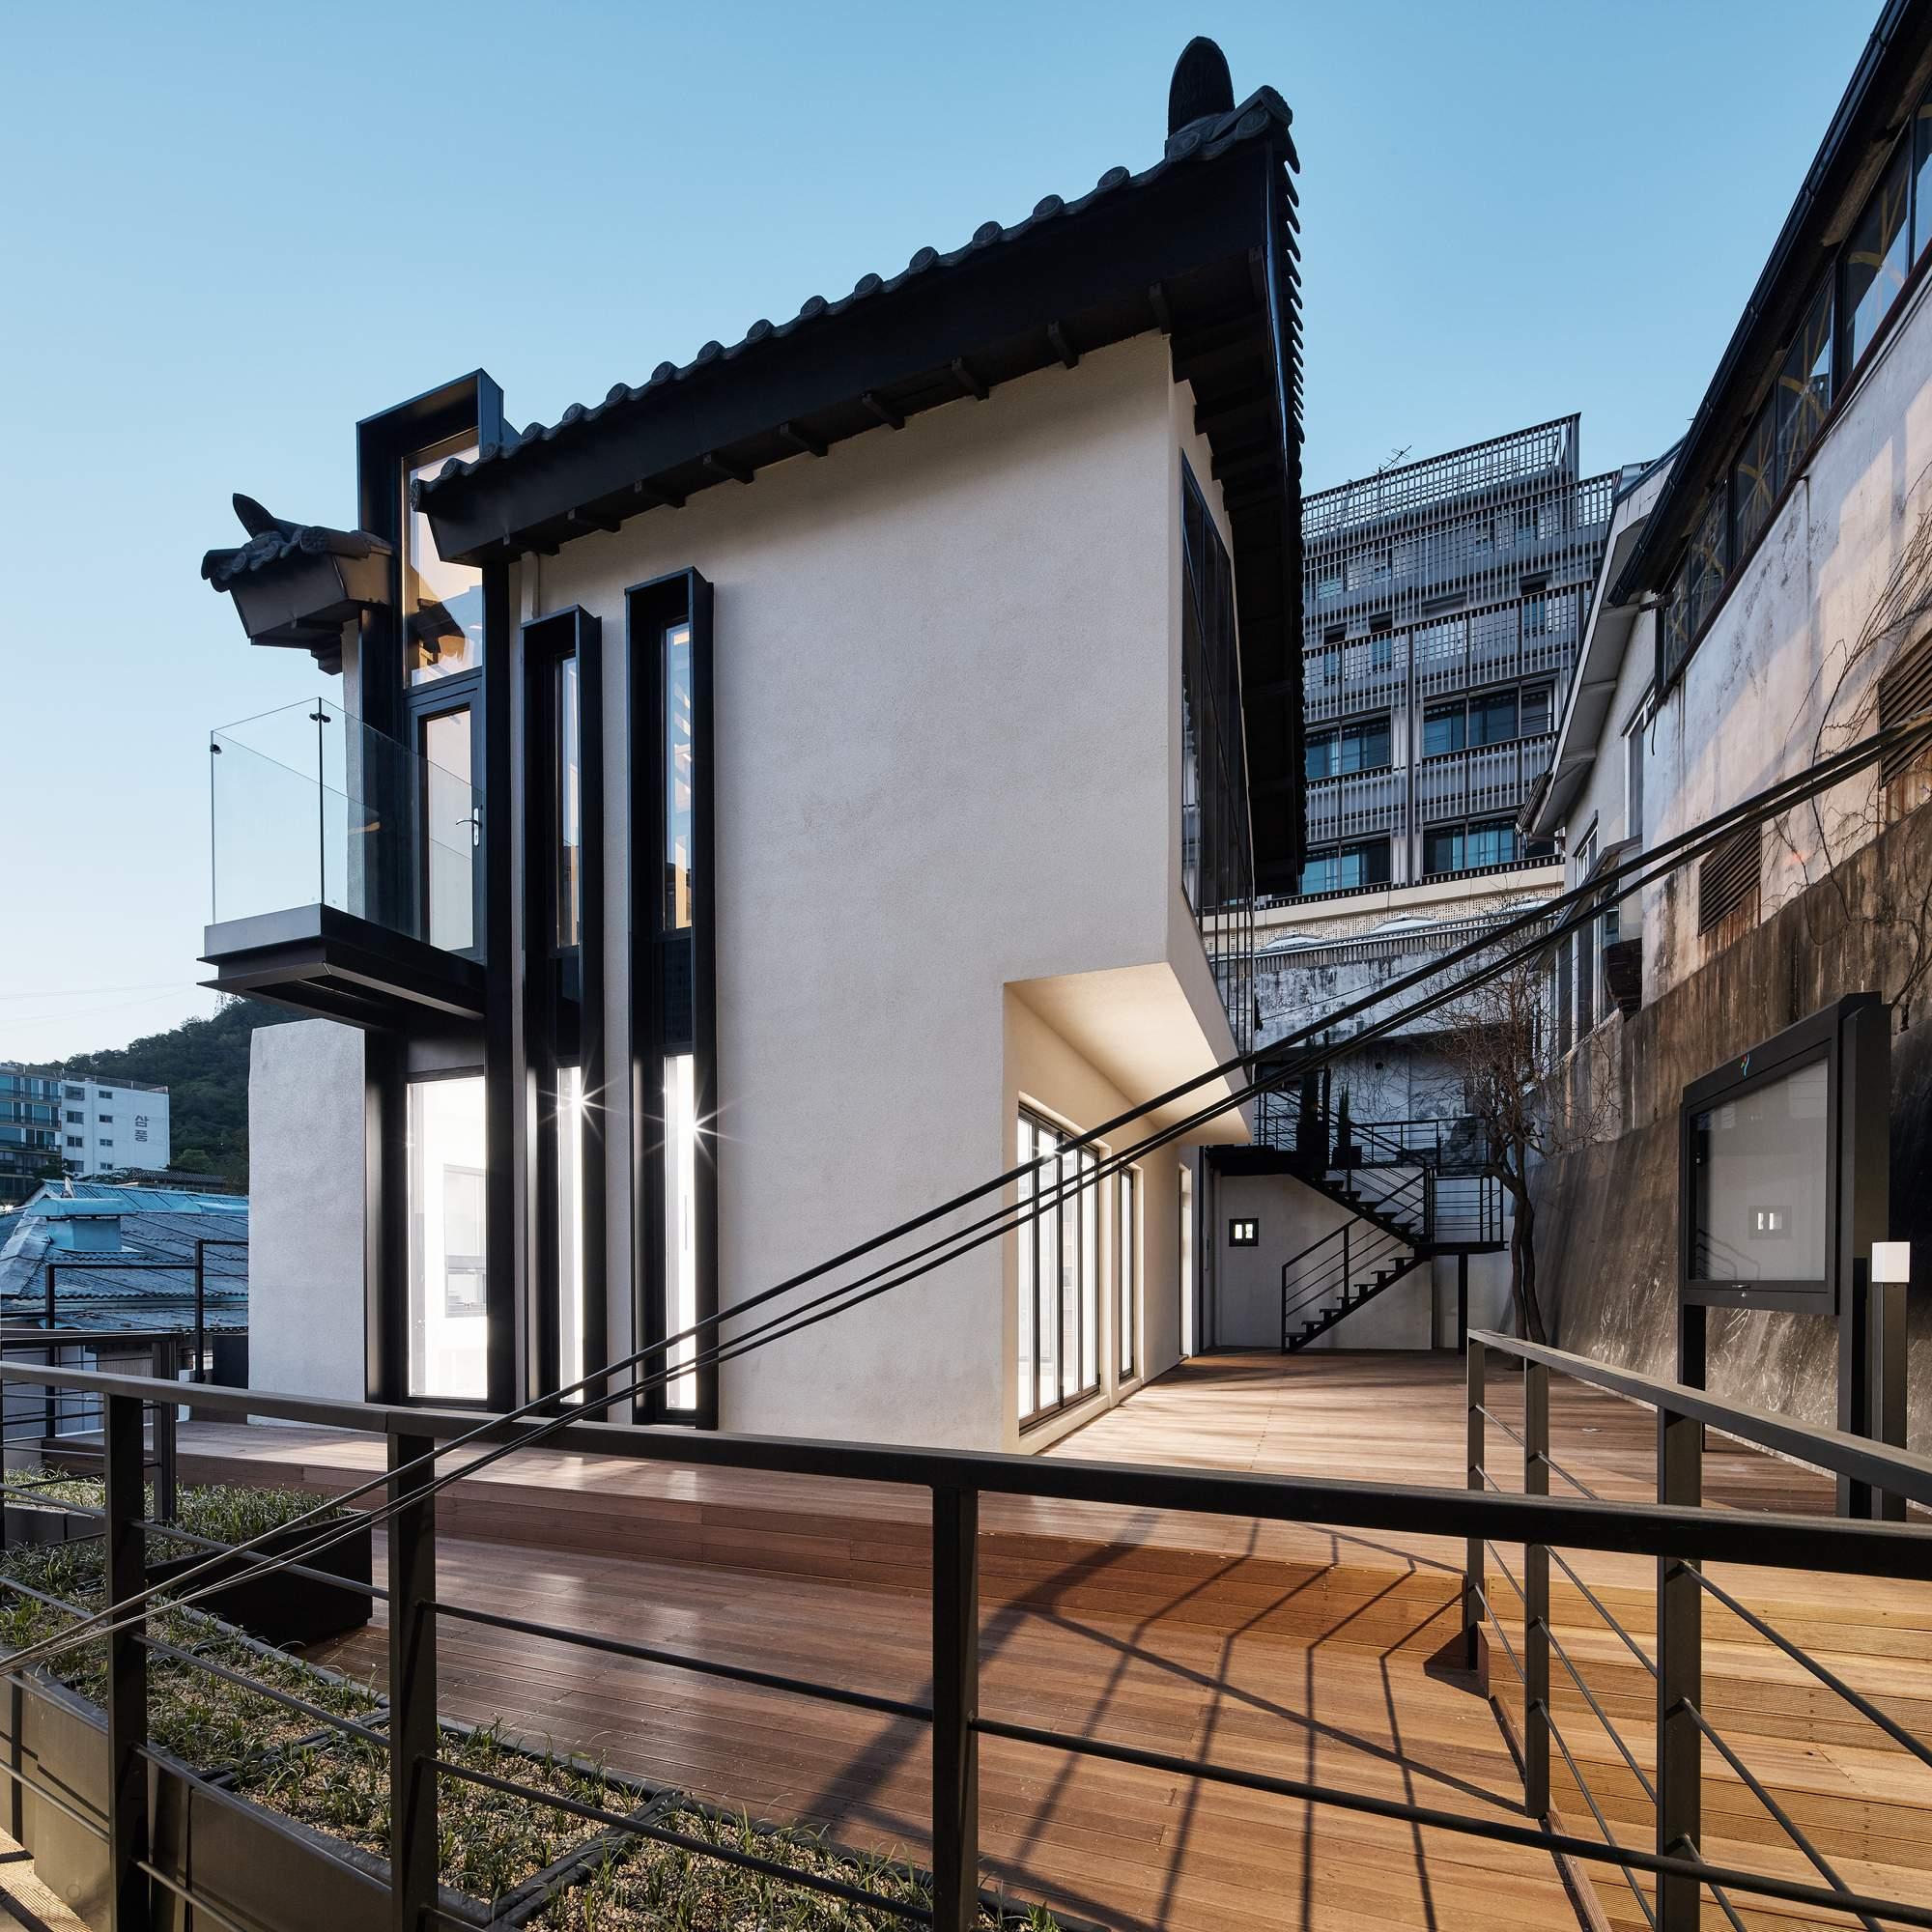 Общественный центр Hoehyeon, Южная Корея